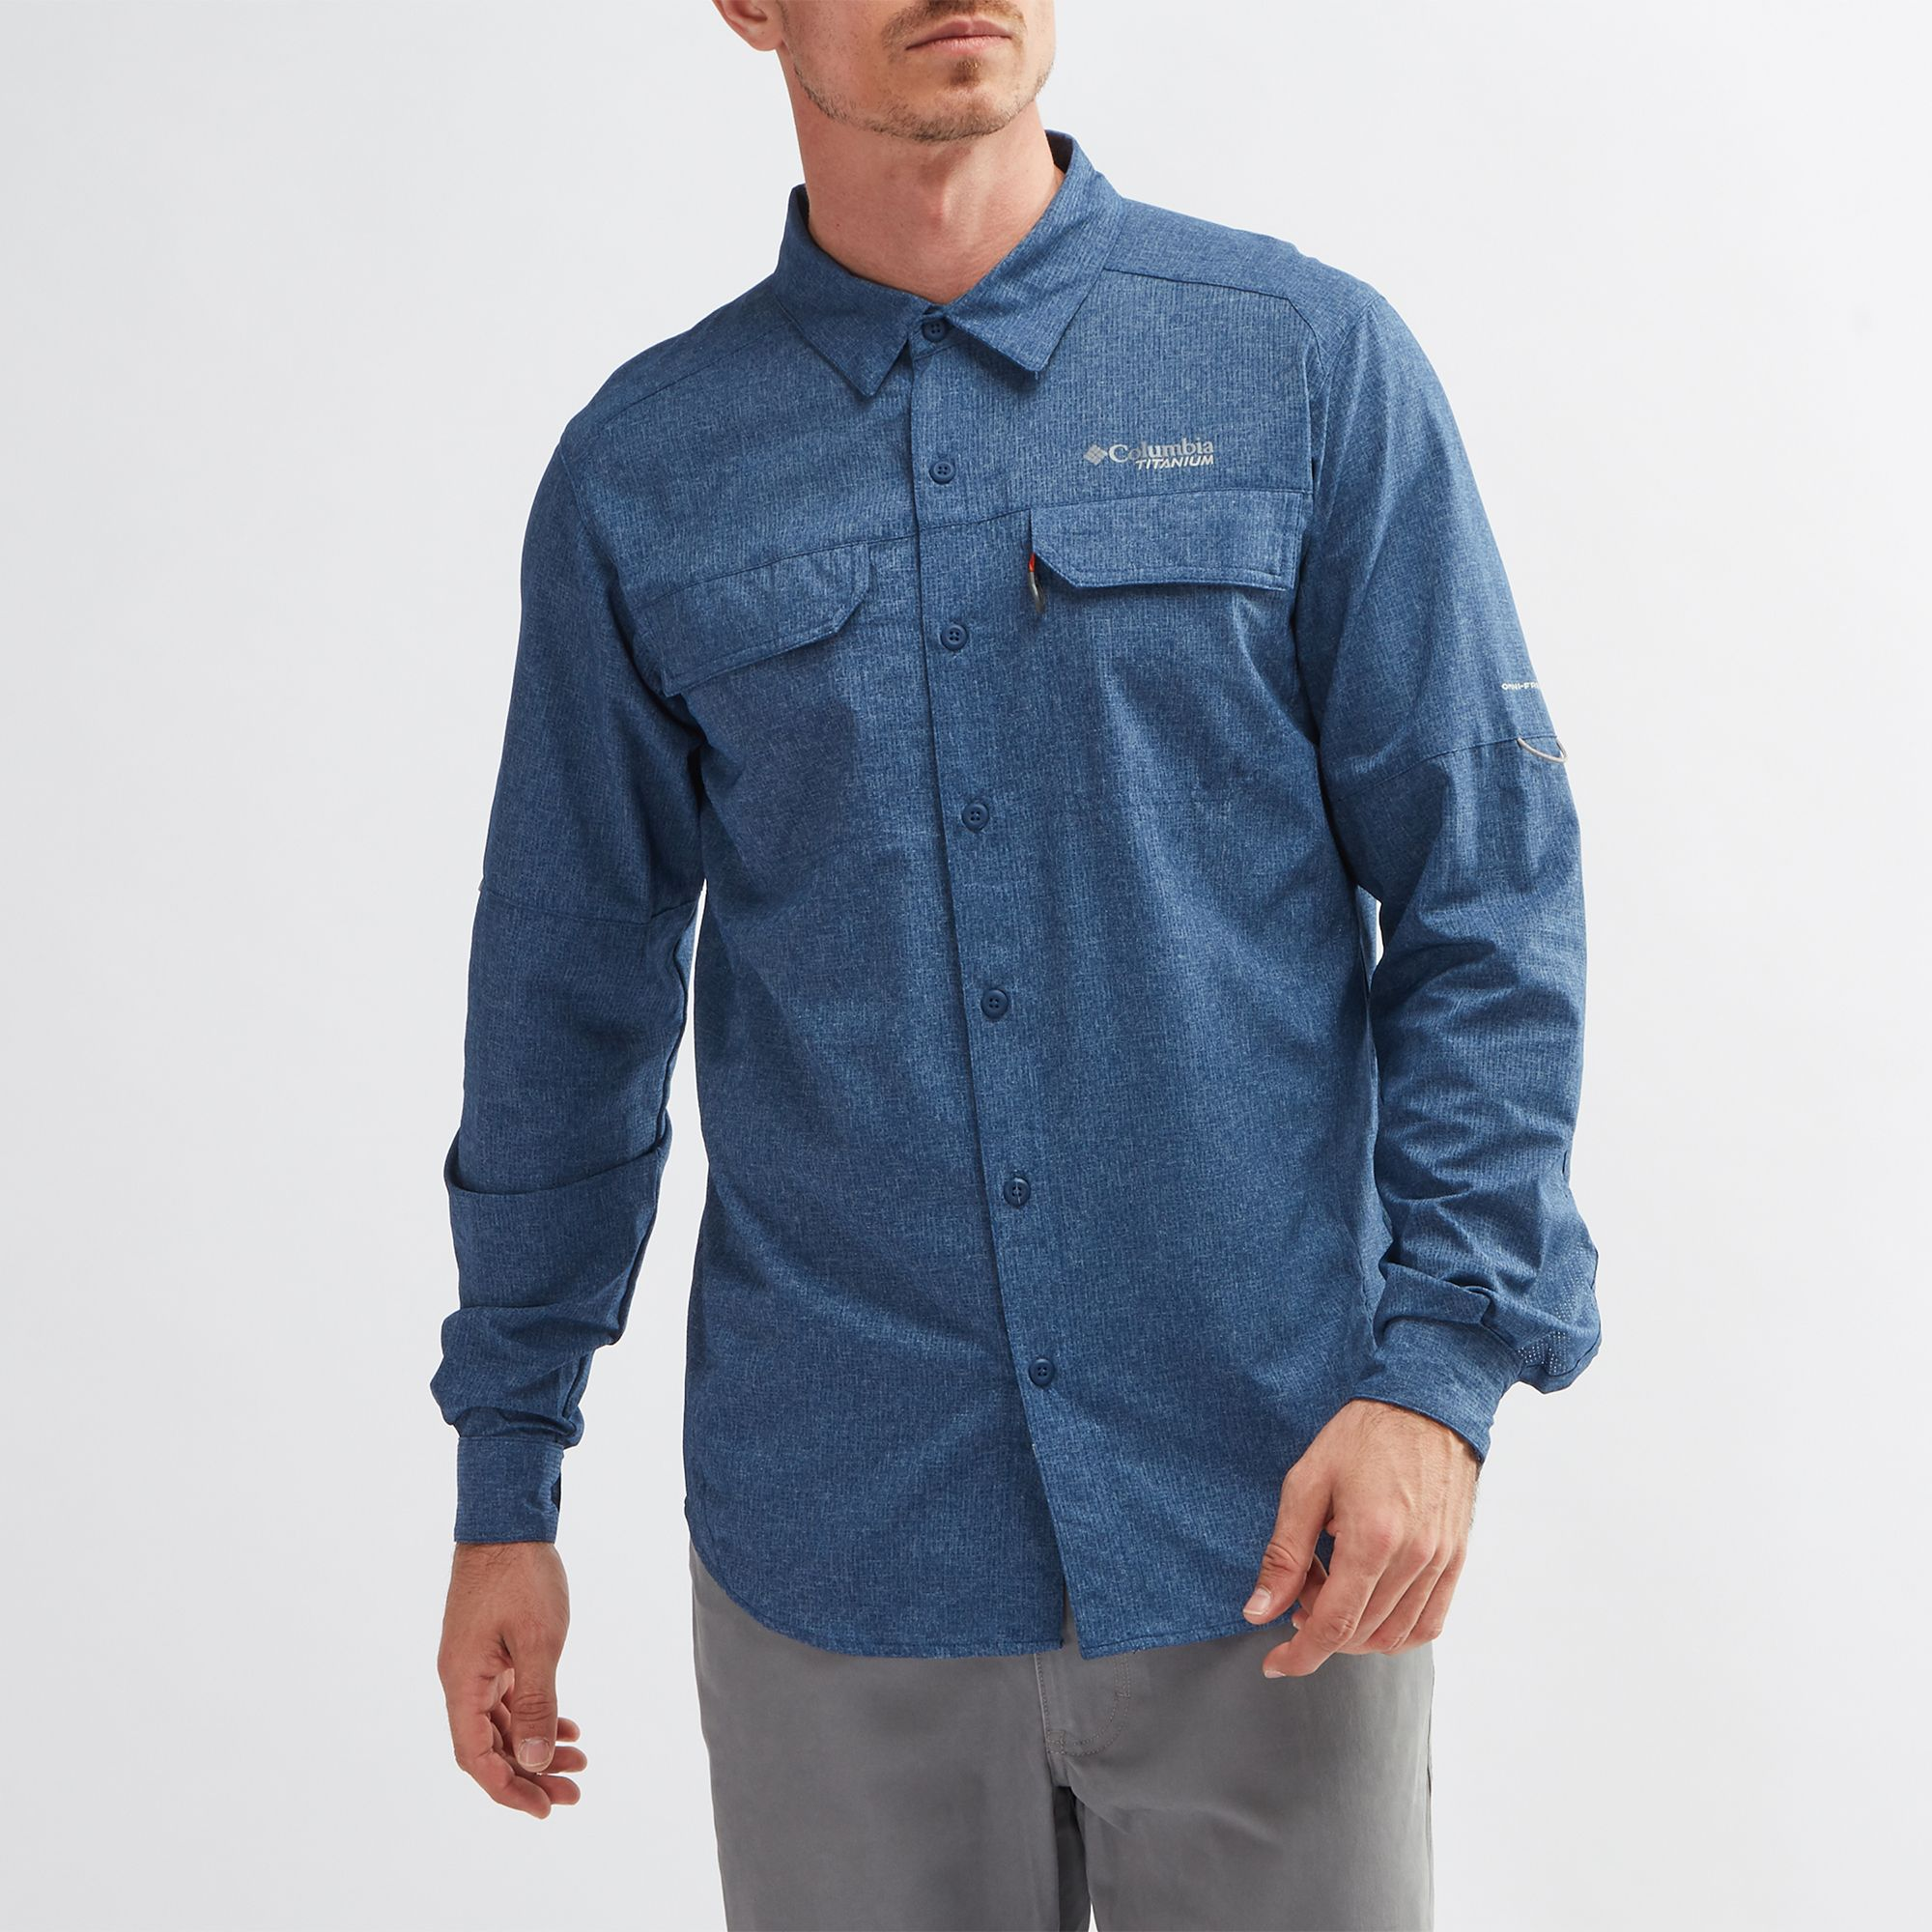 c5359a18cbd Columbia Irico Long Sleeve Shirt Clma 1654423 469 in Riyadh, KSA | SSS